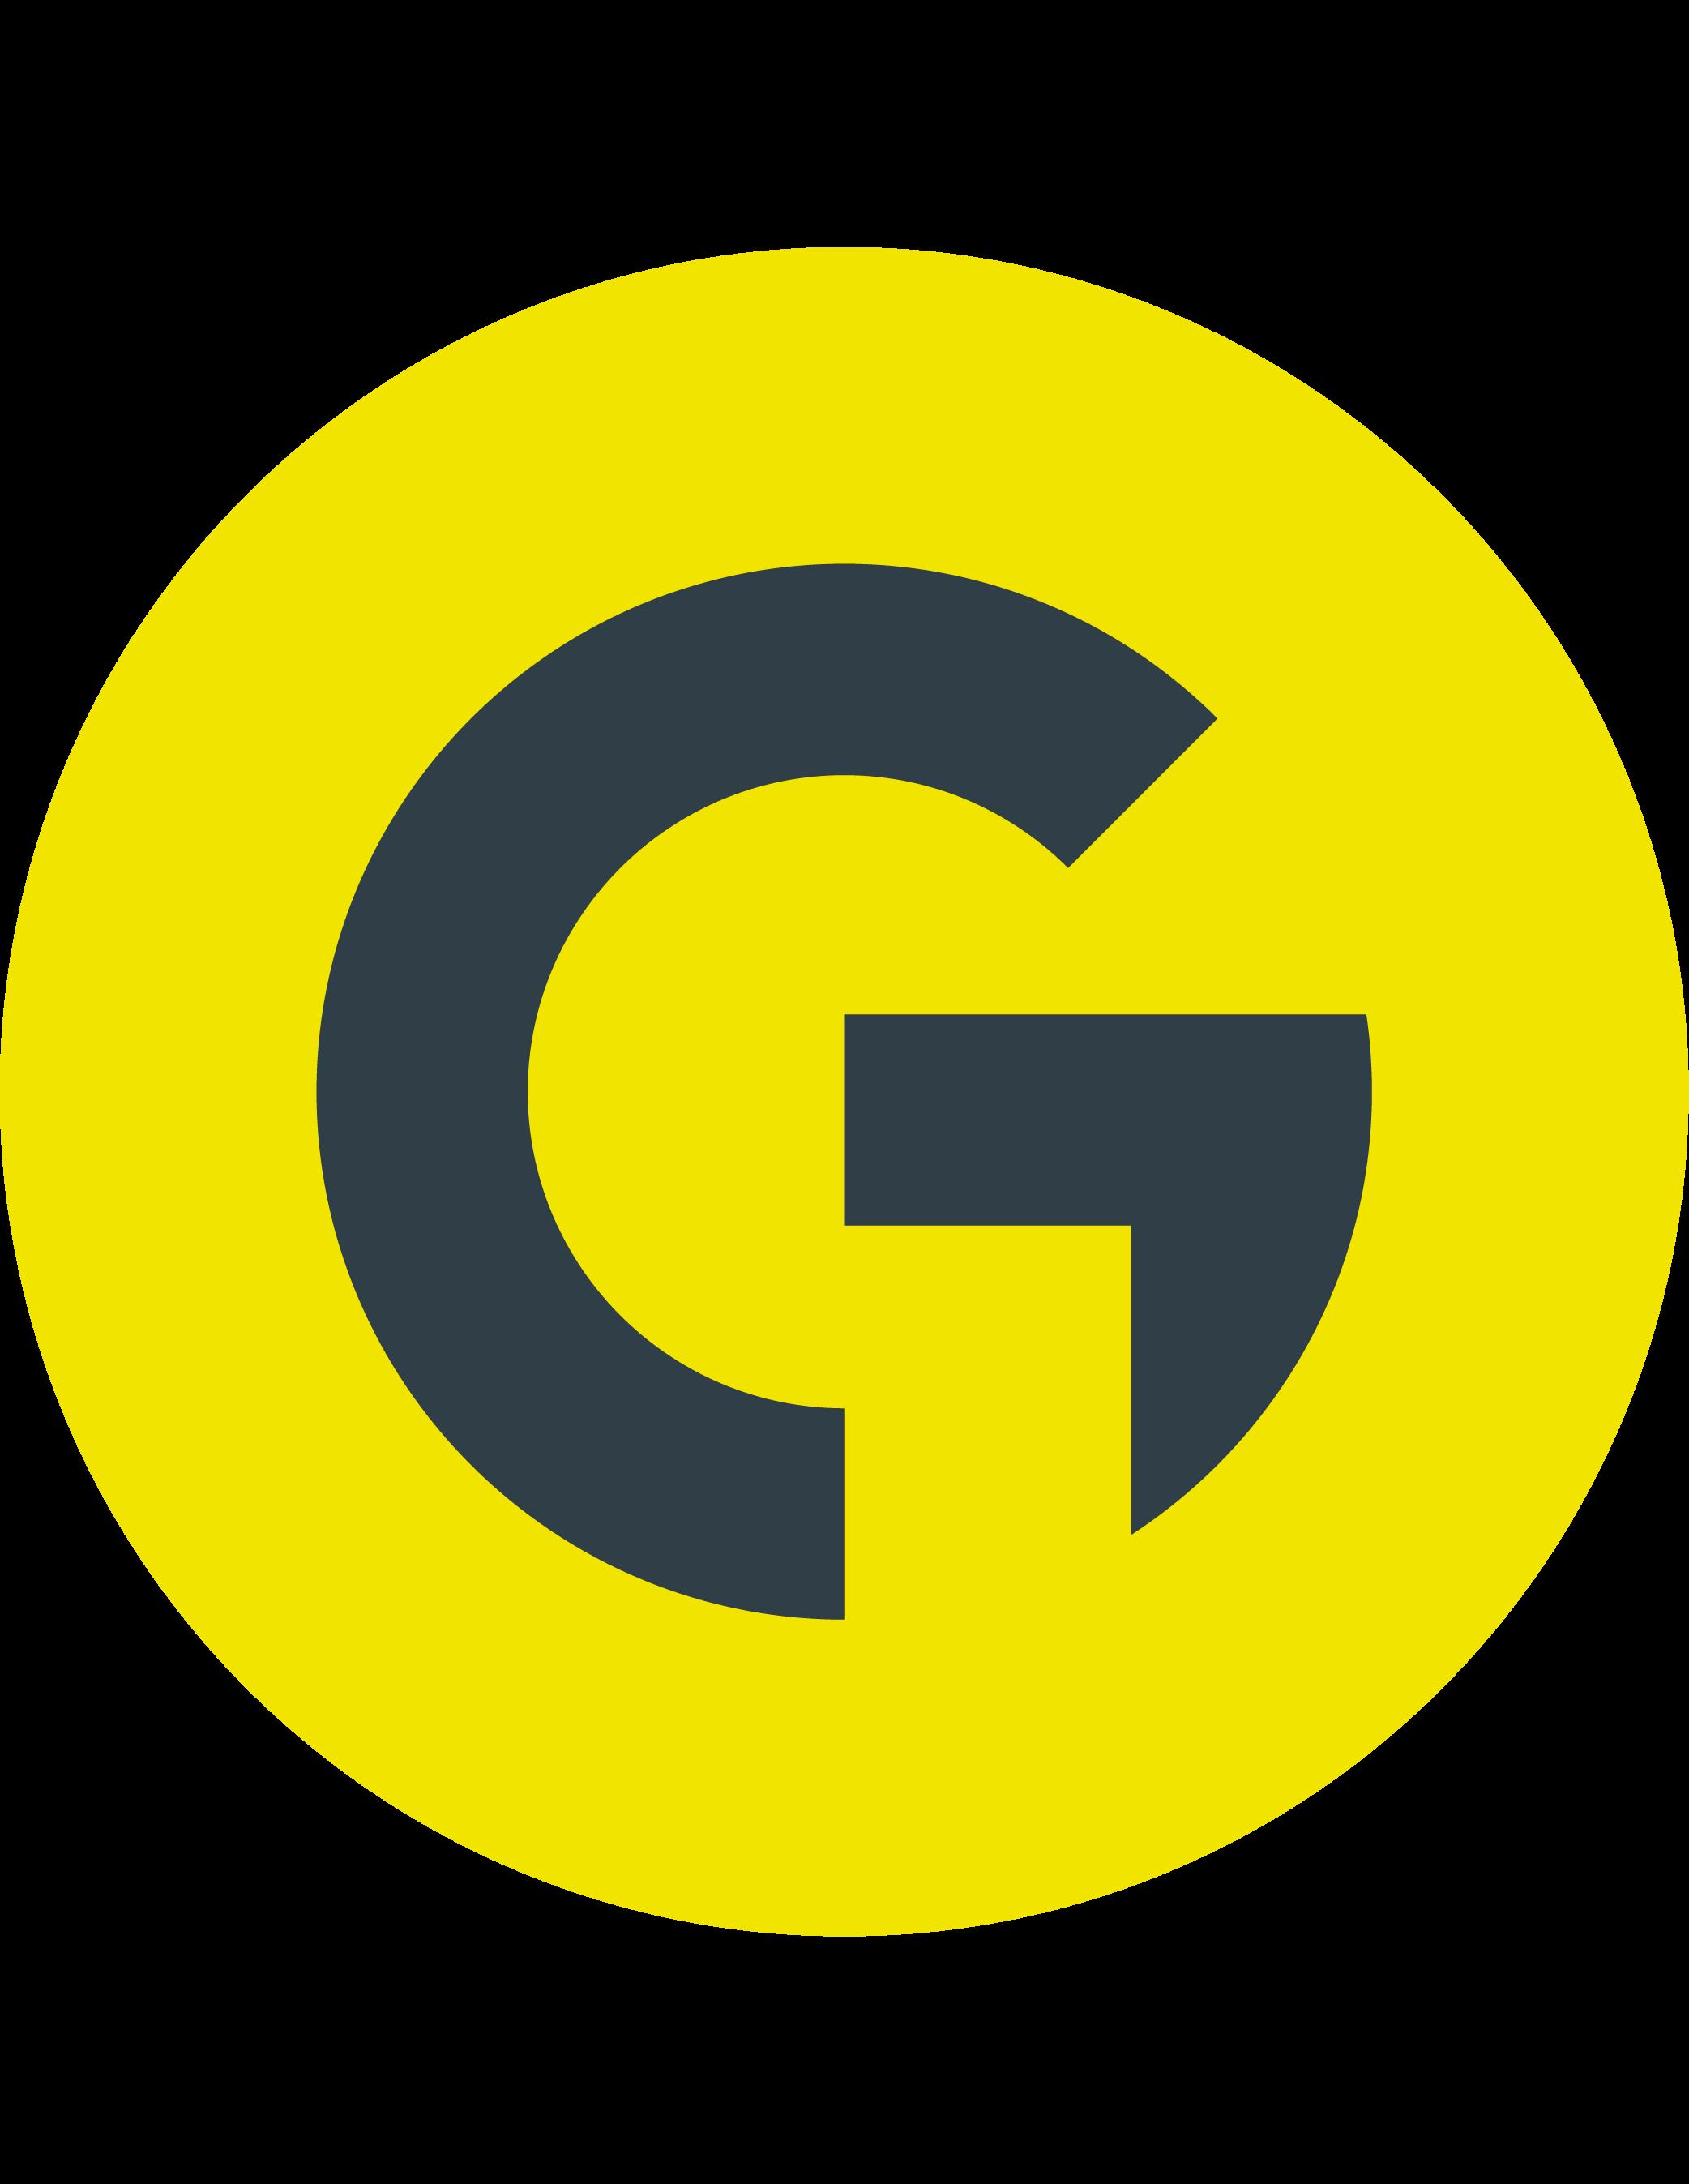 MARC PHILIPP GEMBALLA GmbH